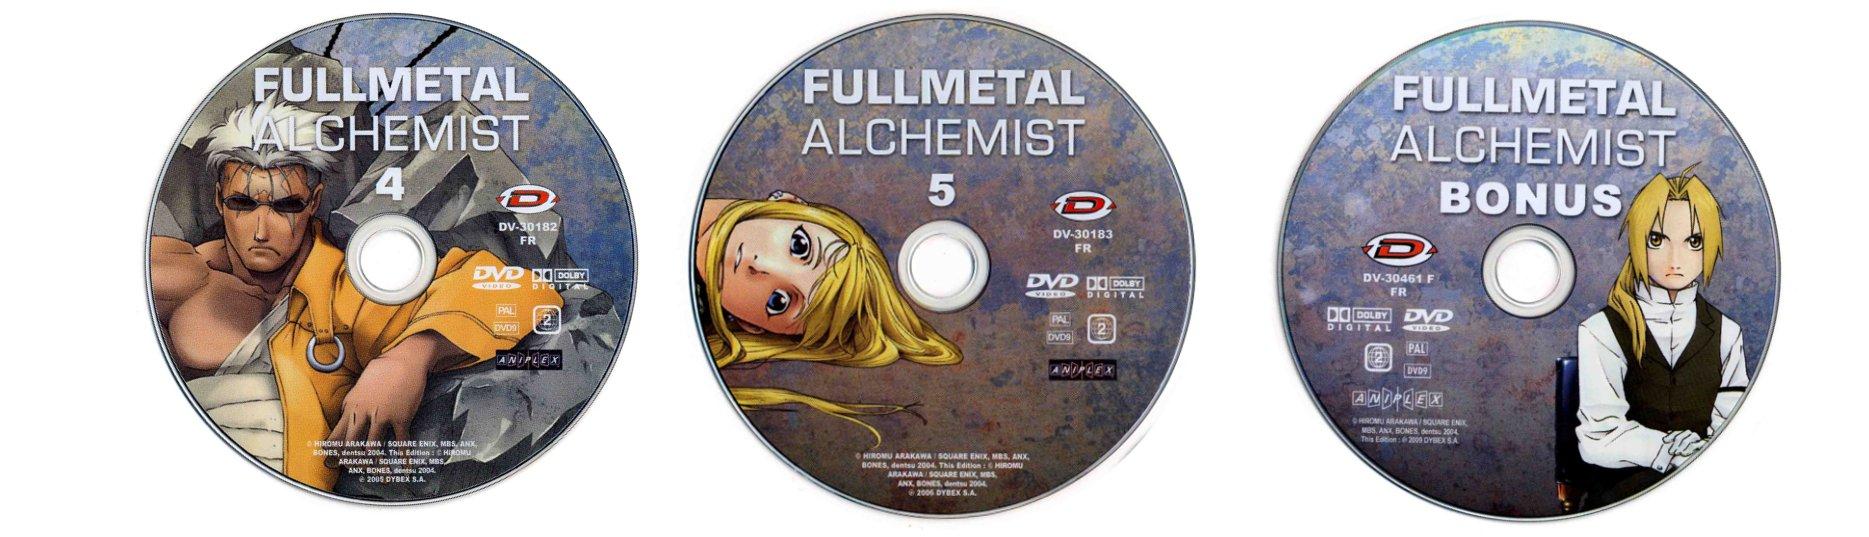 DVD de Fullmetal Alchemist